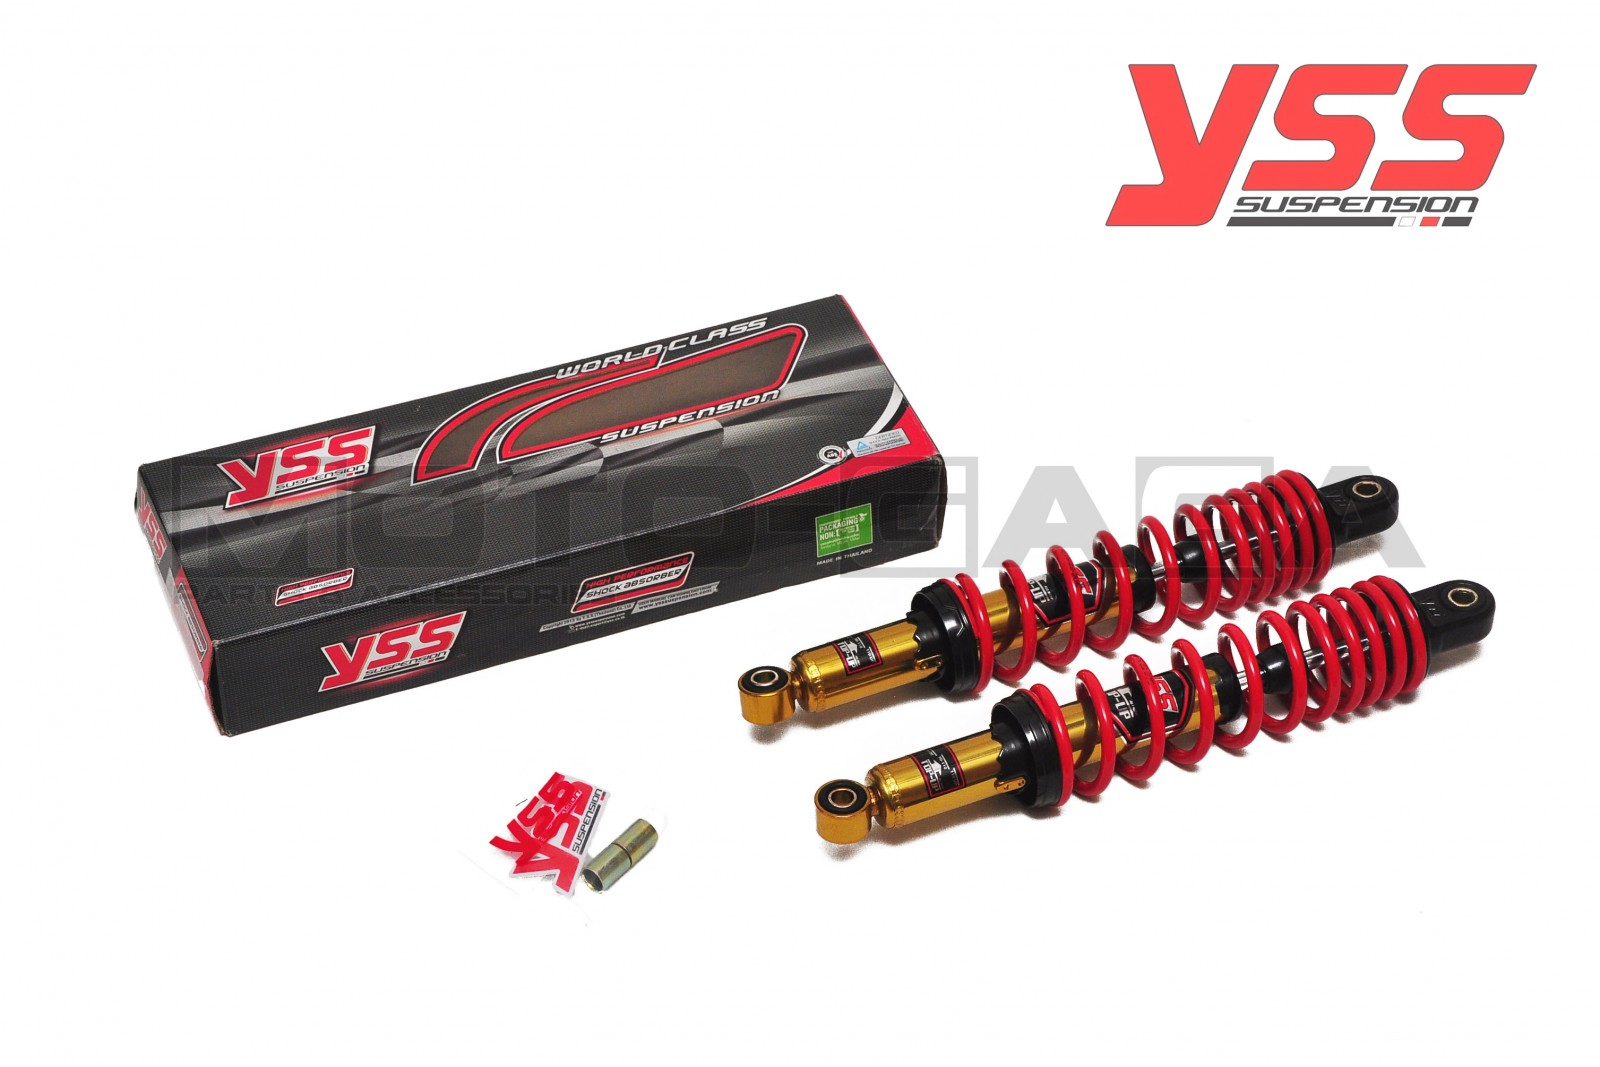 YSS TOP UP Dual Shock Absorbers (340mm) - Universal/Honda/Yamaha